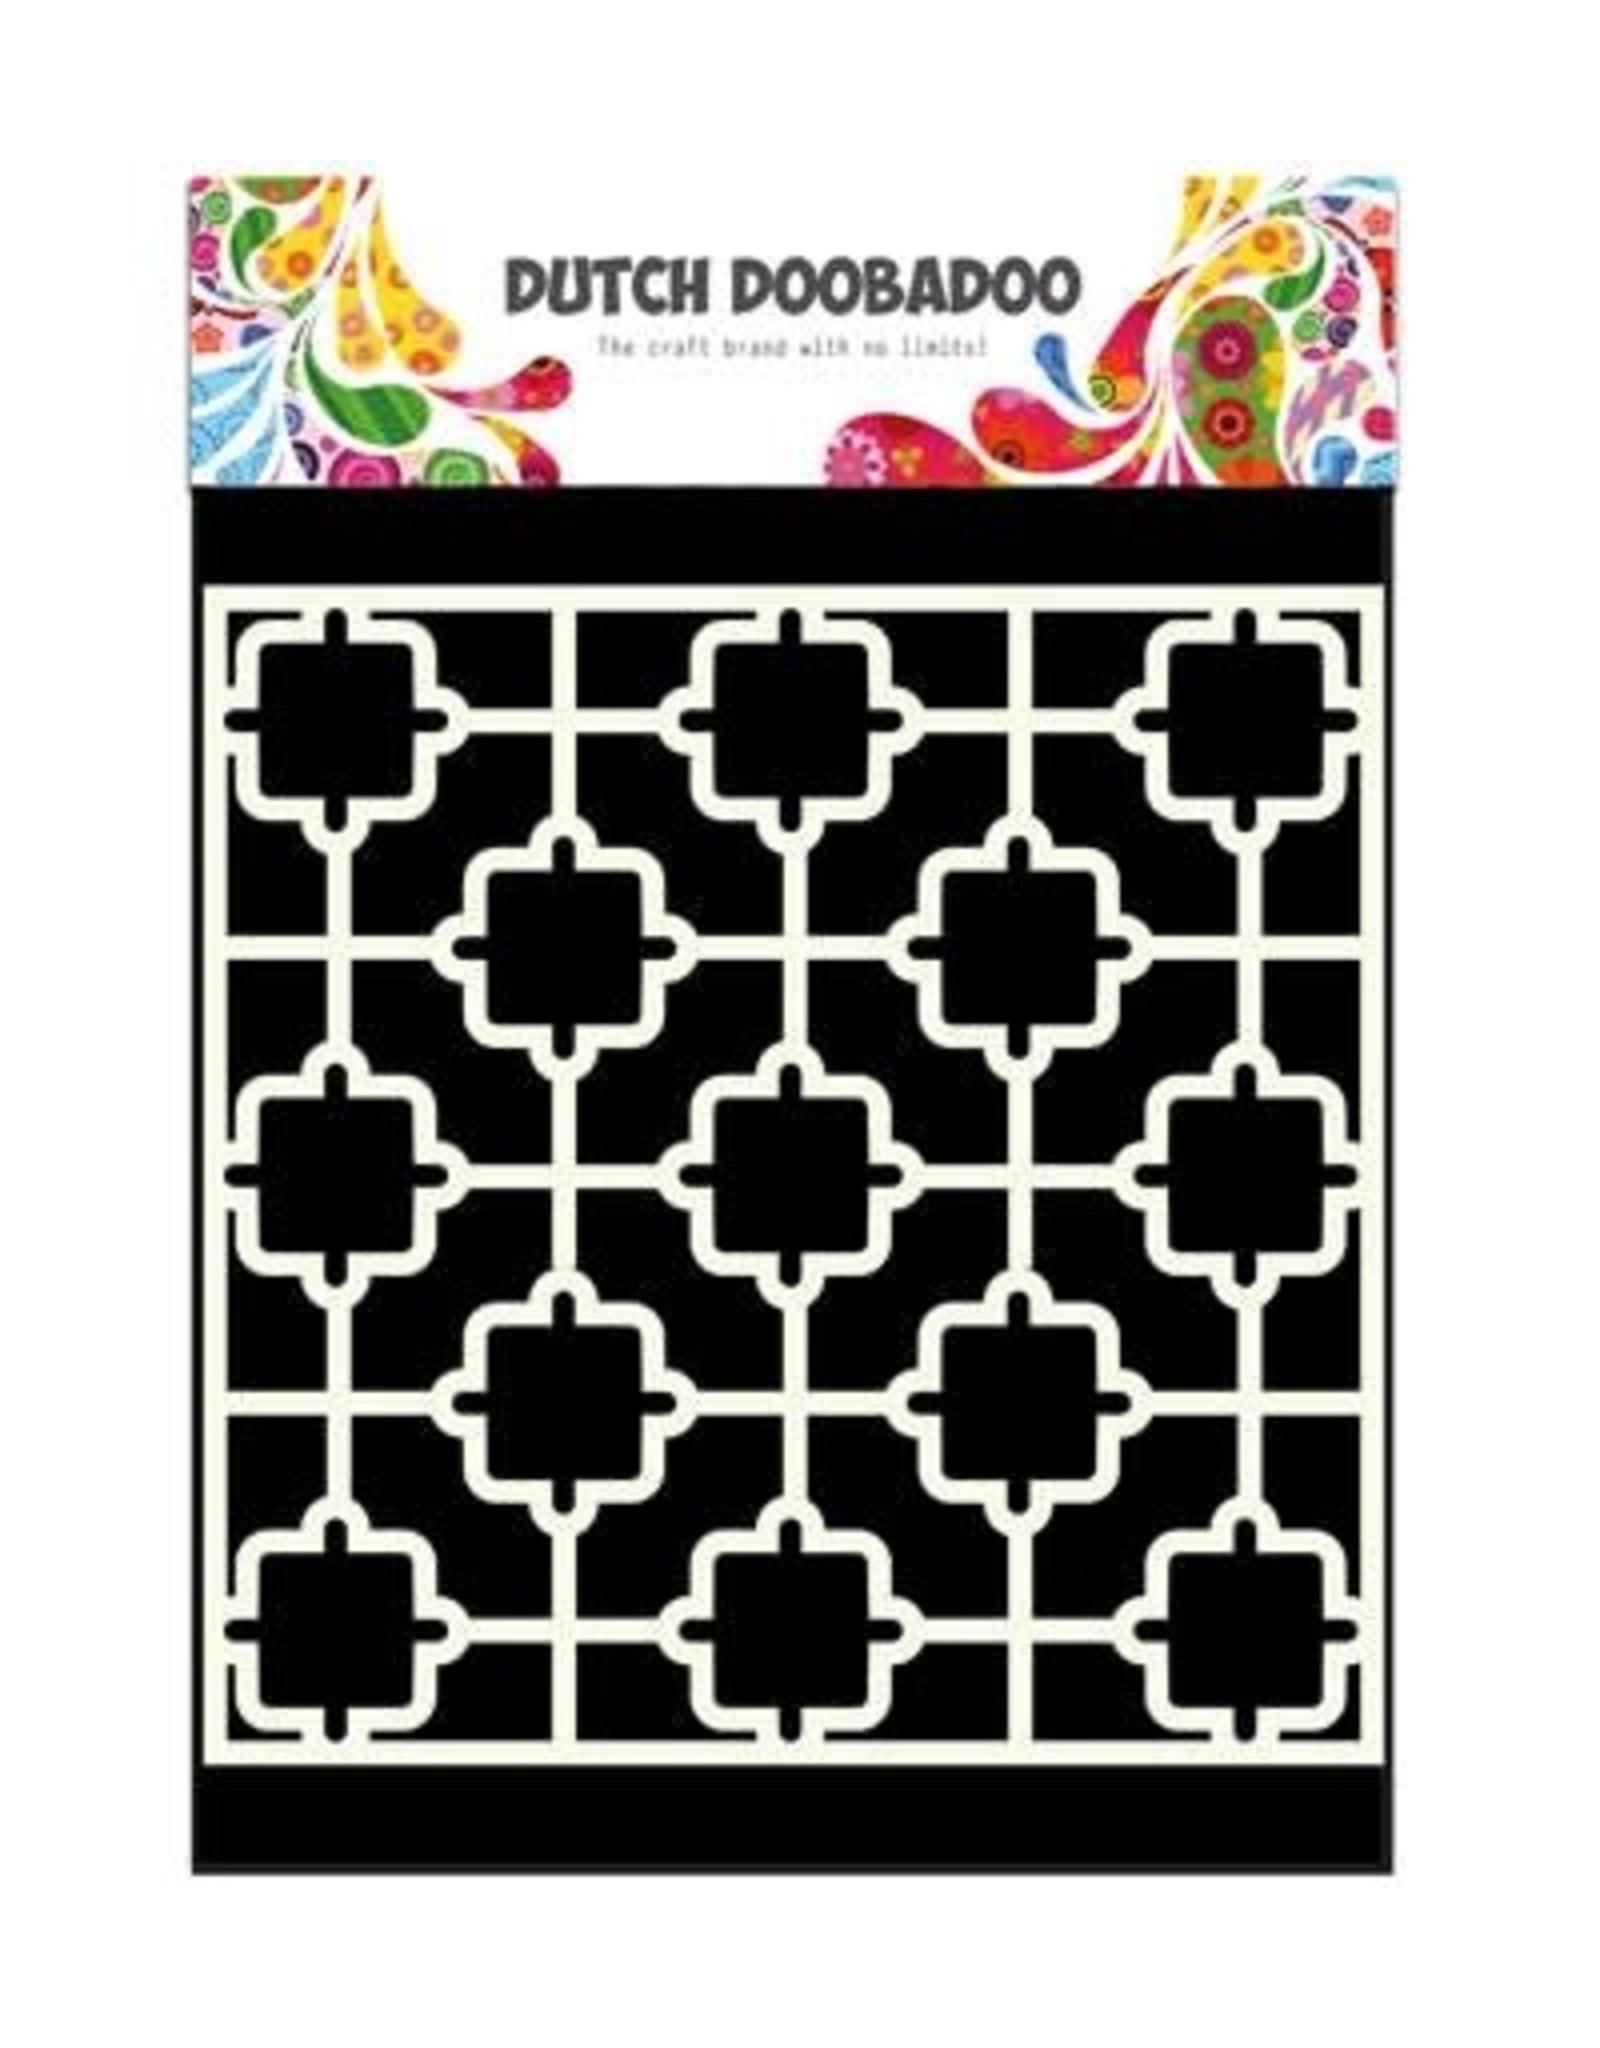 Dutch Doobadoo Mask Art Dutch Doobadoo Mask art tile 470.715.601